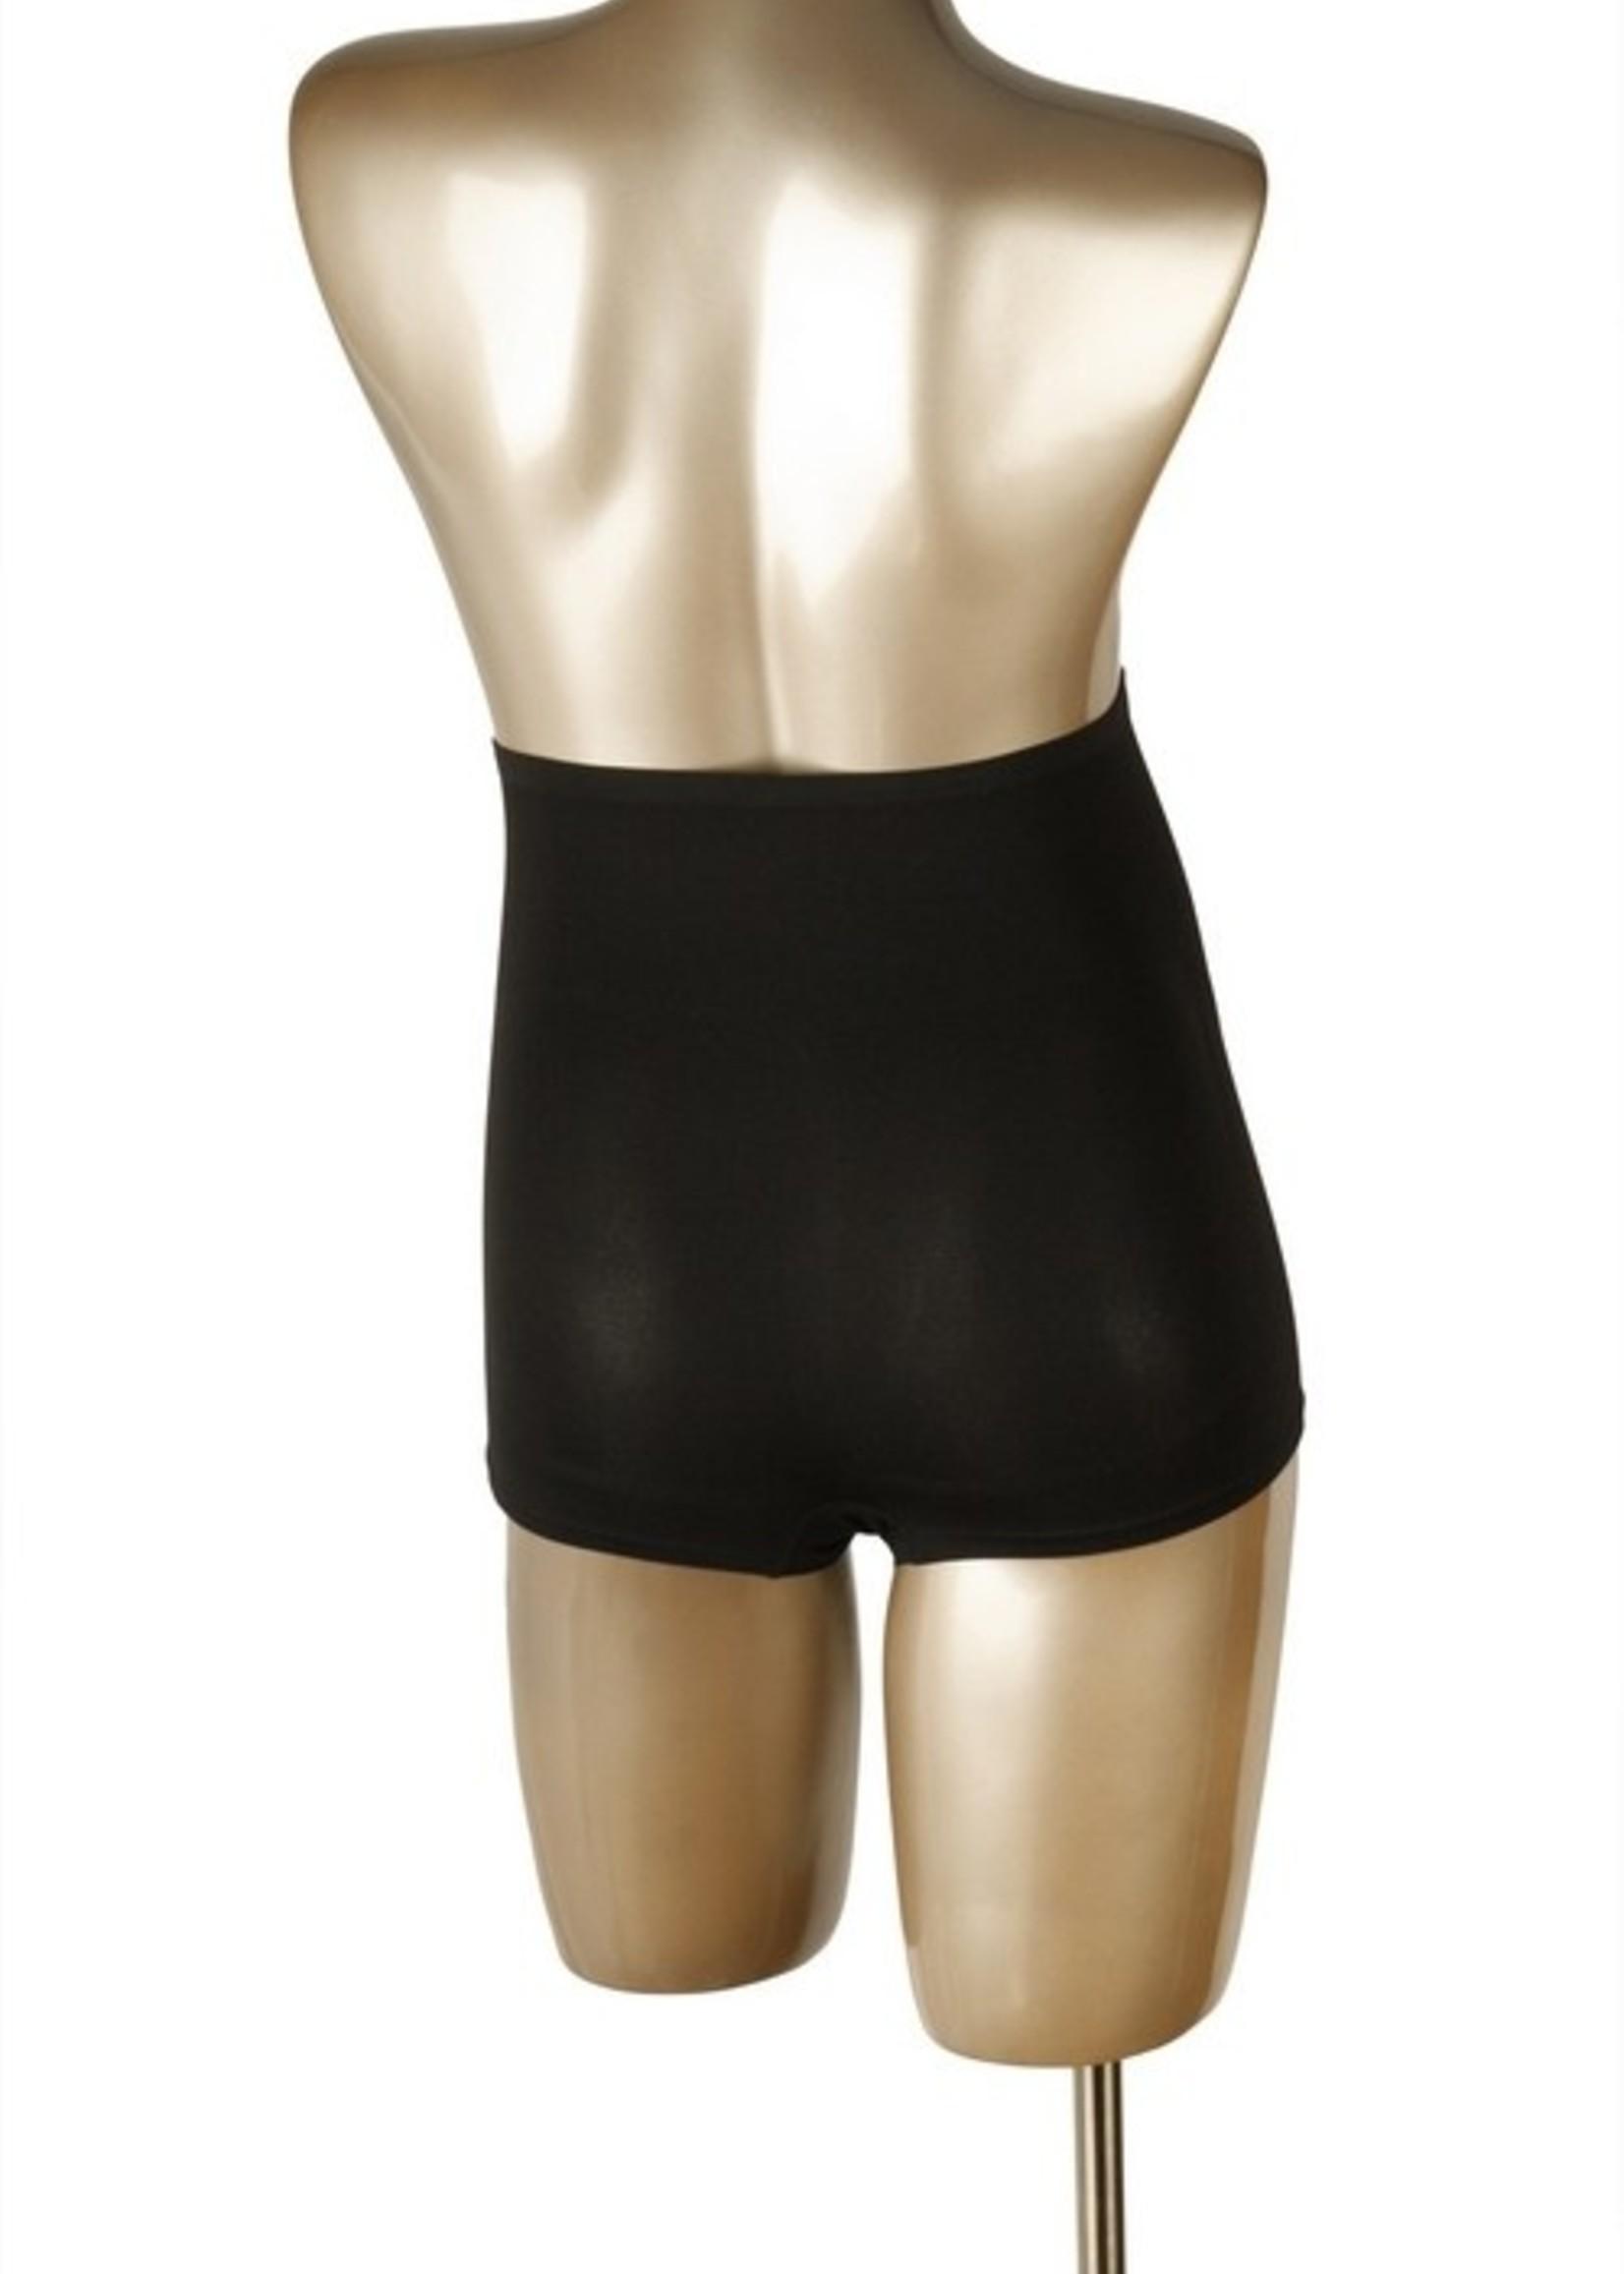 MAMSY Boxershorts Black